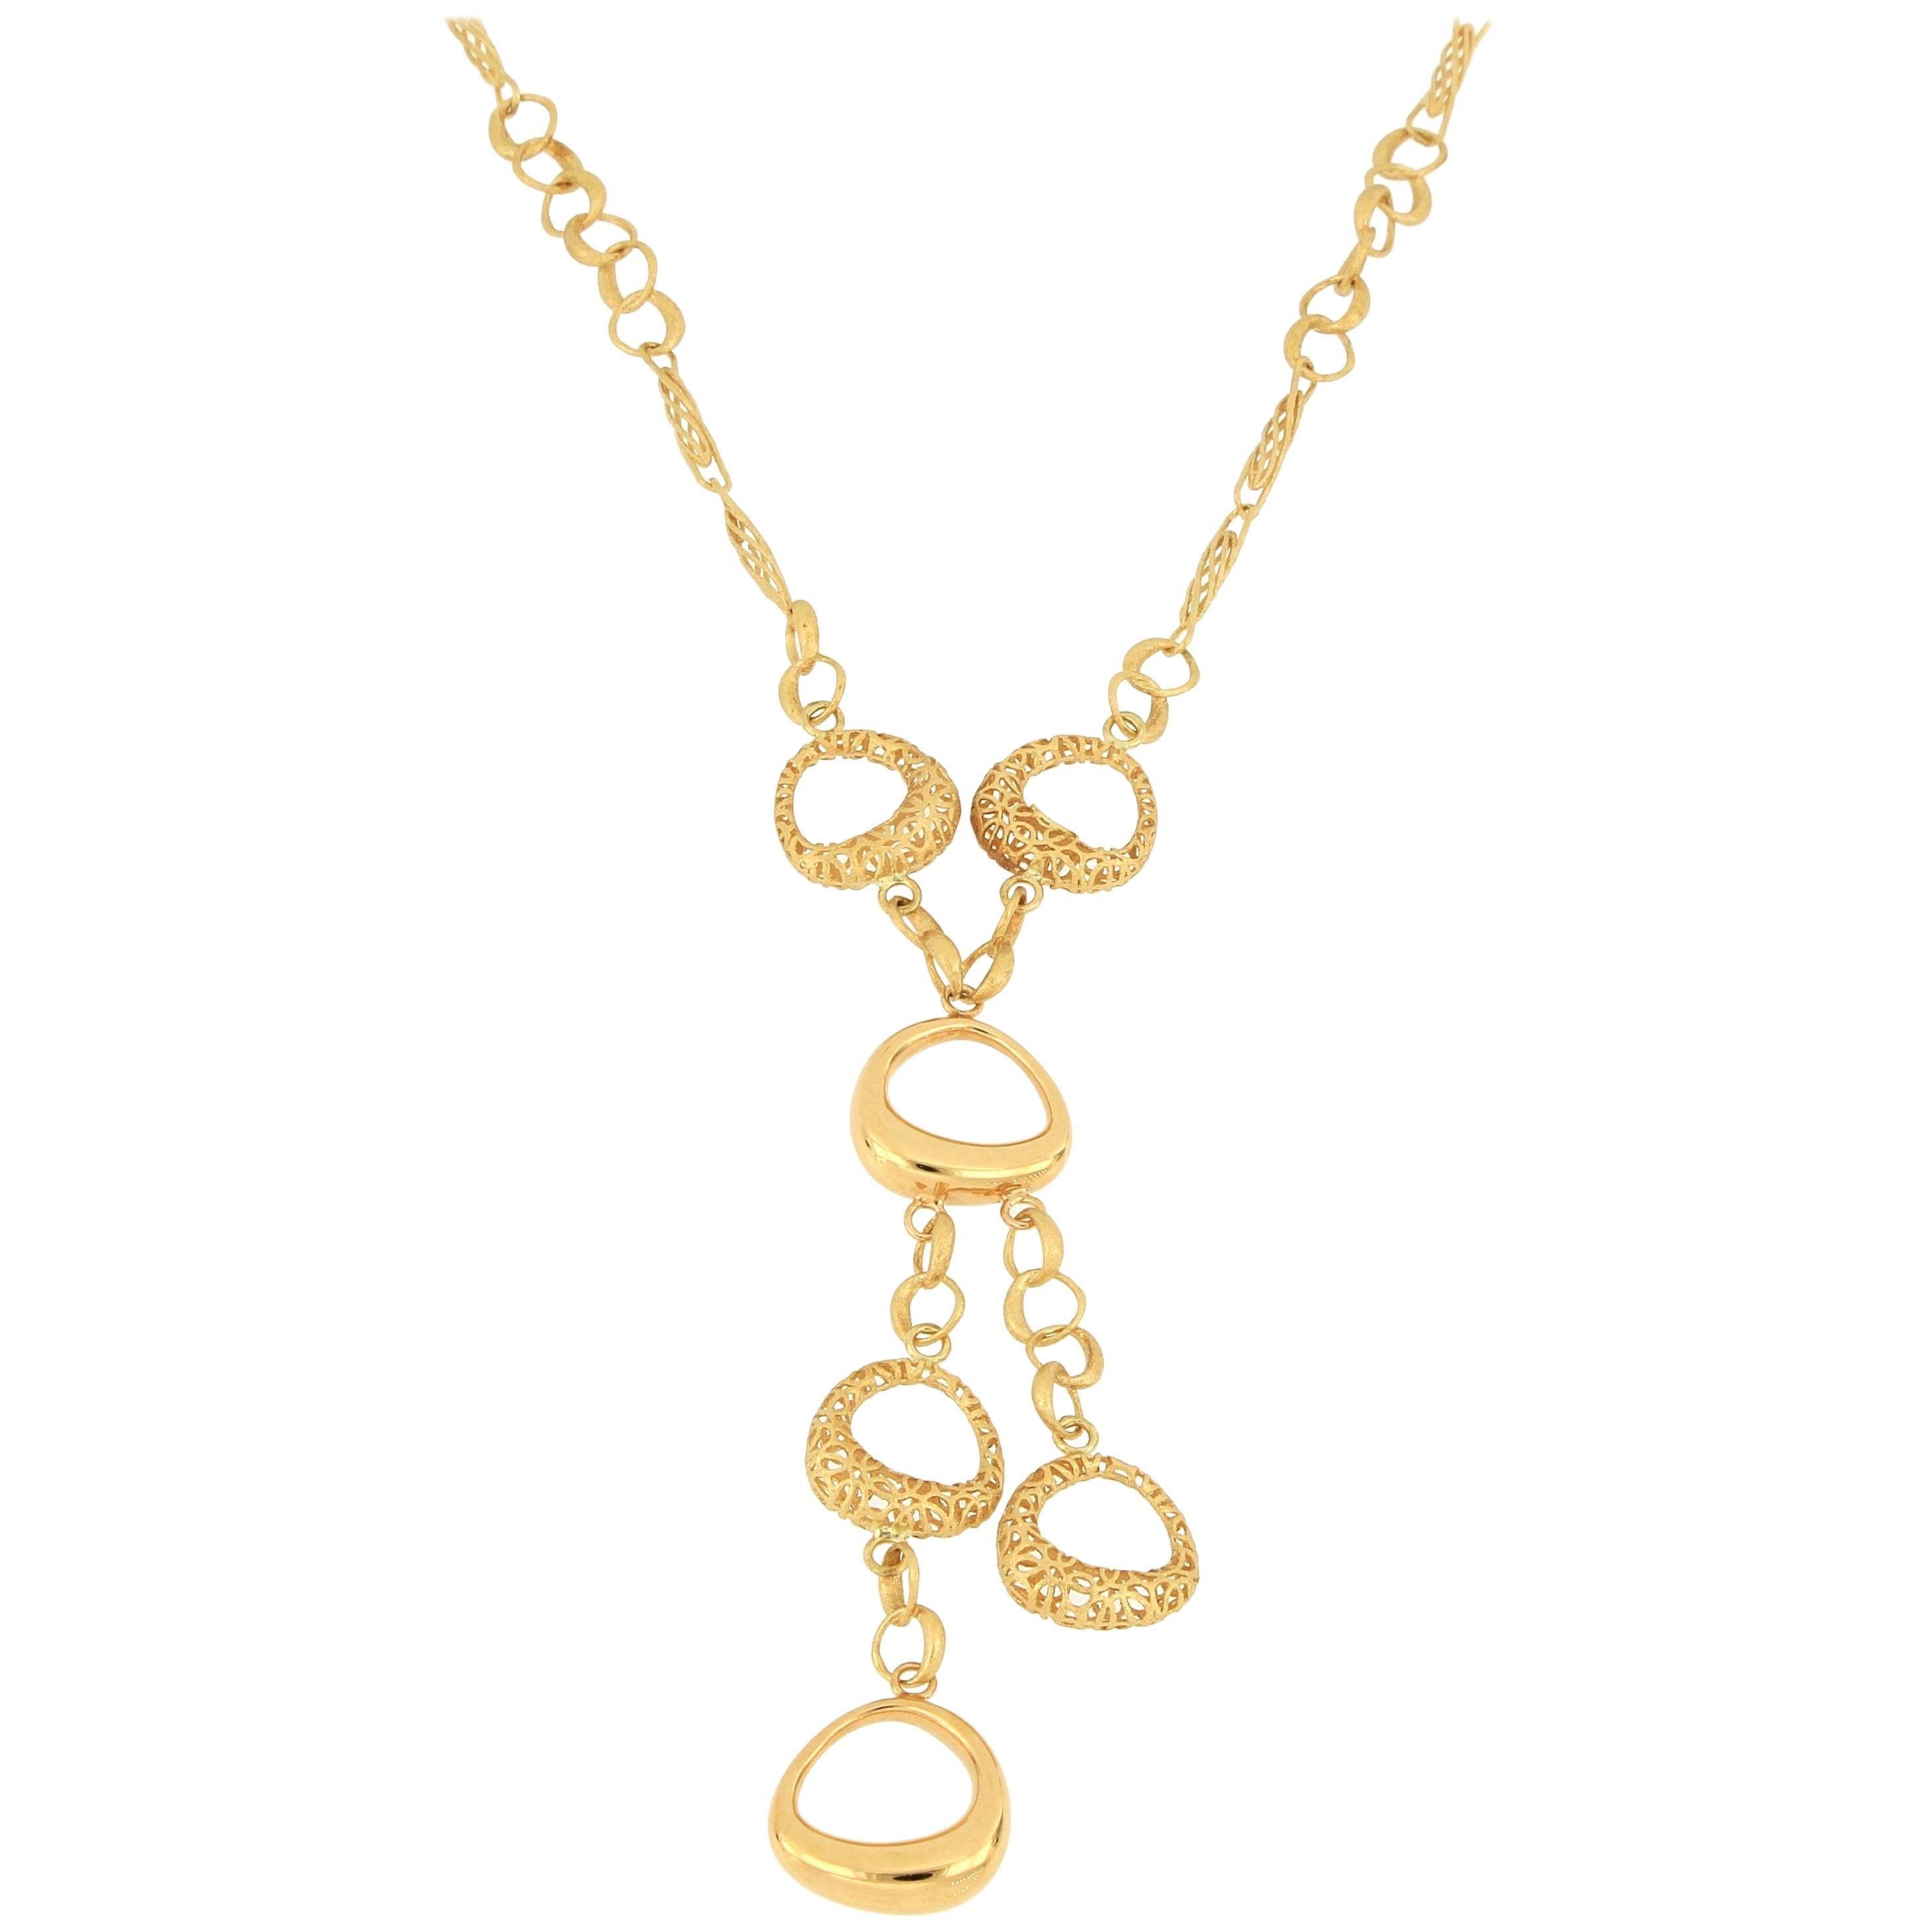 18 Karat Fabulous Gold Necklace